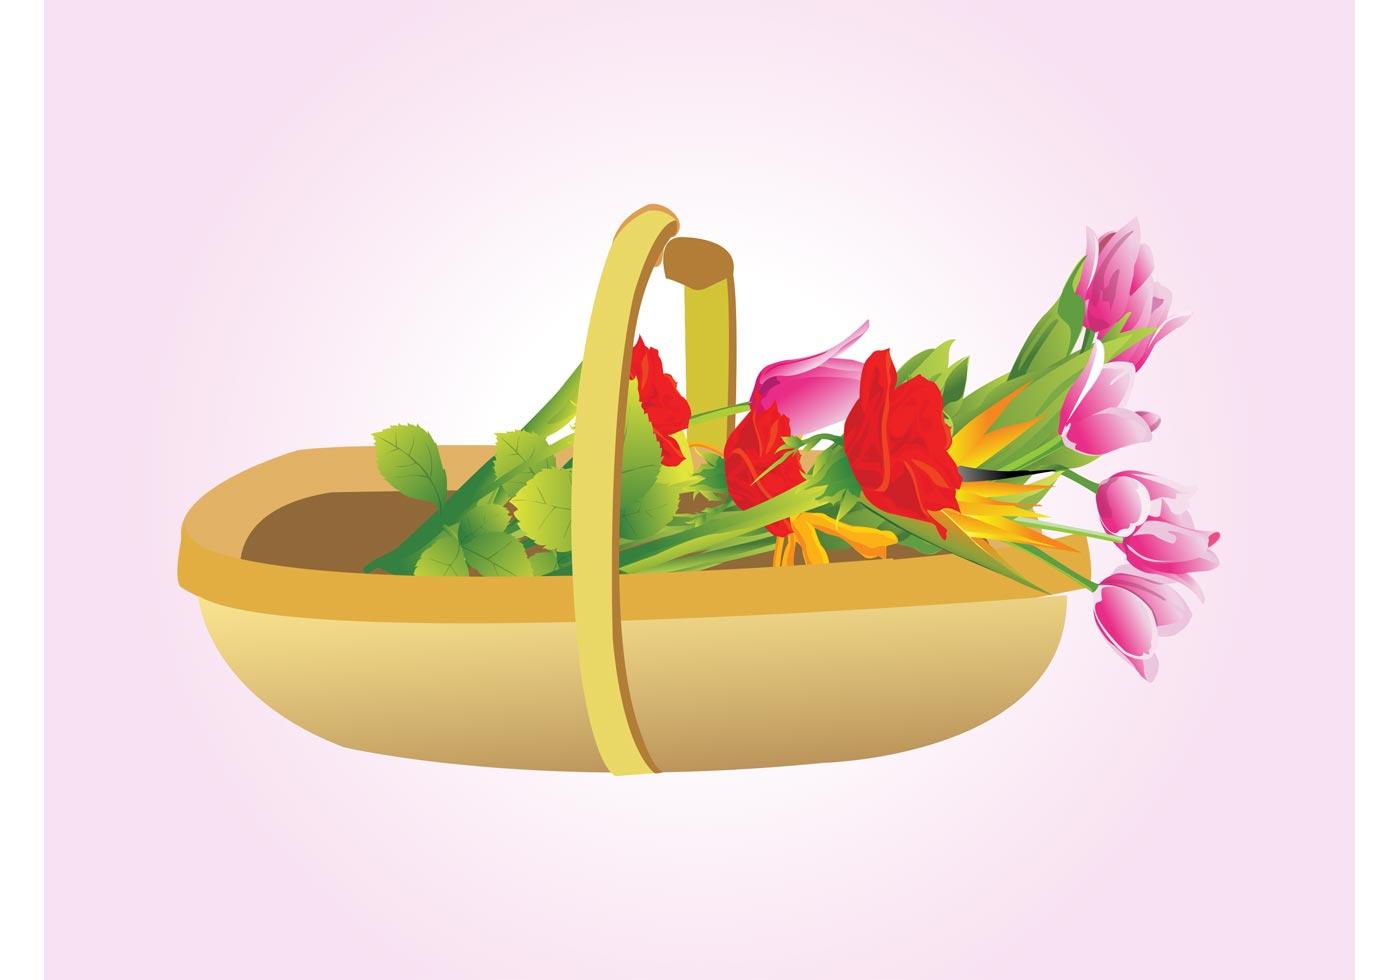 Flower Baskets Vector : Flowers basket vector download free art stock